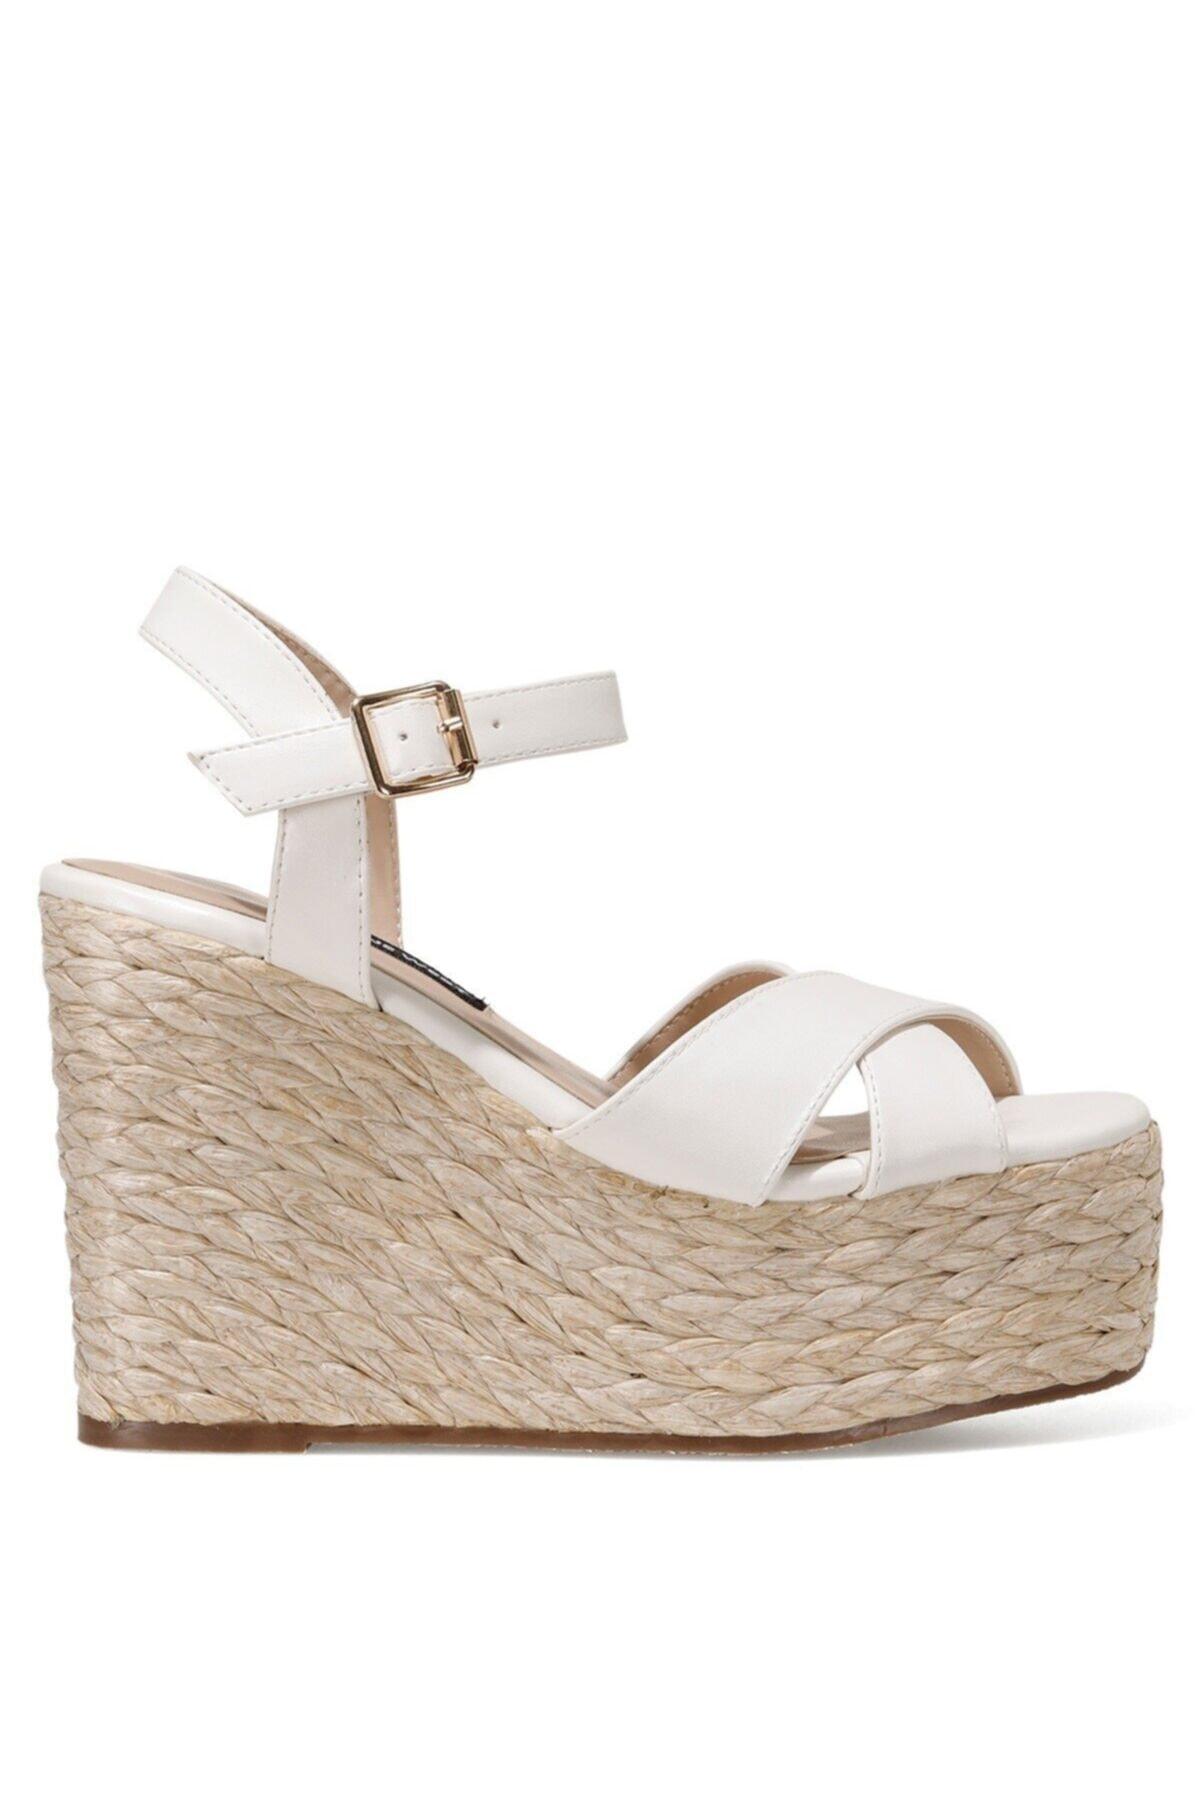 Nine West WIEMA 1FX Beyaz Kadın Dolgu Topuklu Sandalet 101030115 1